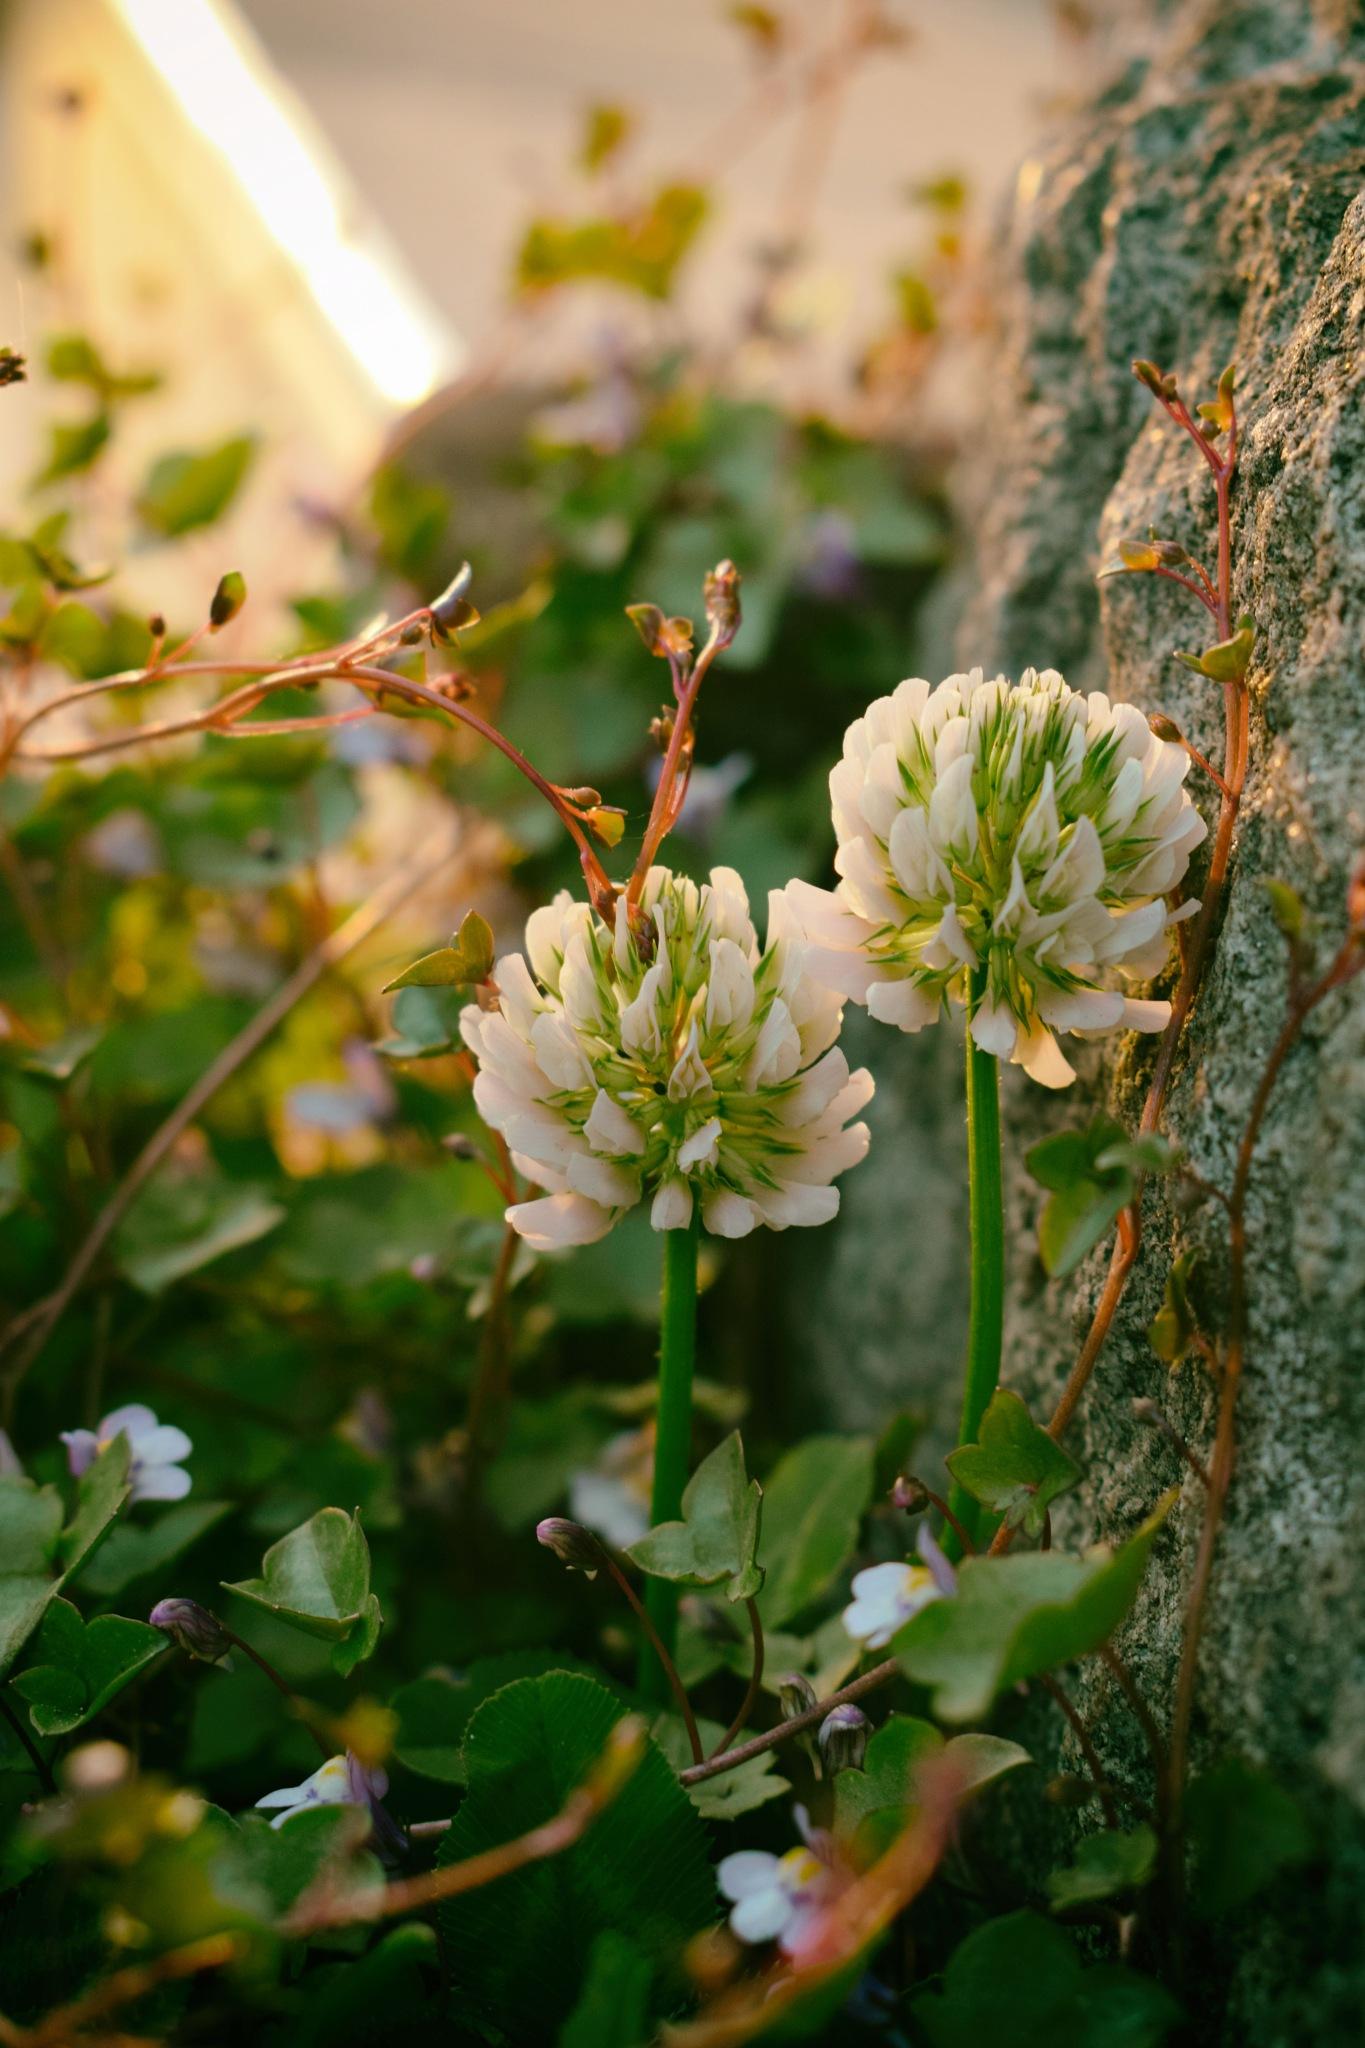 White clover by Javorka